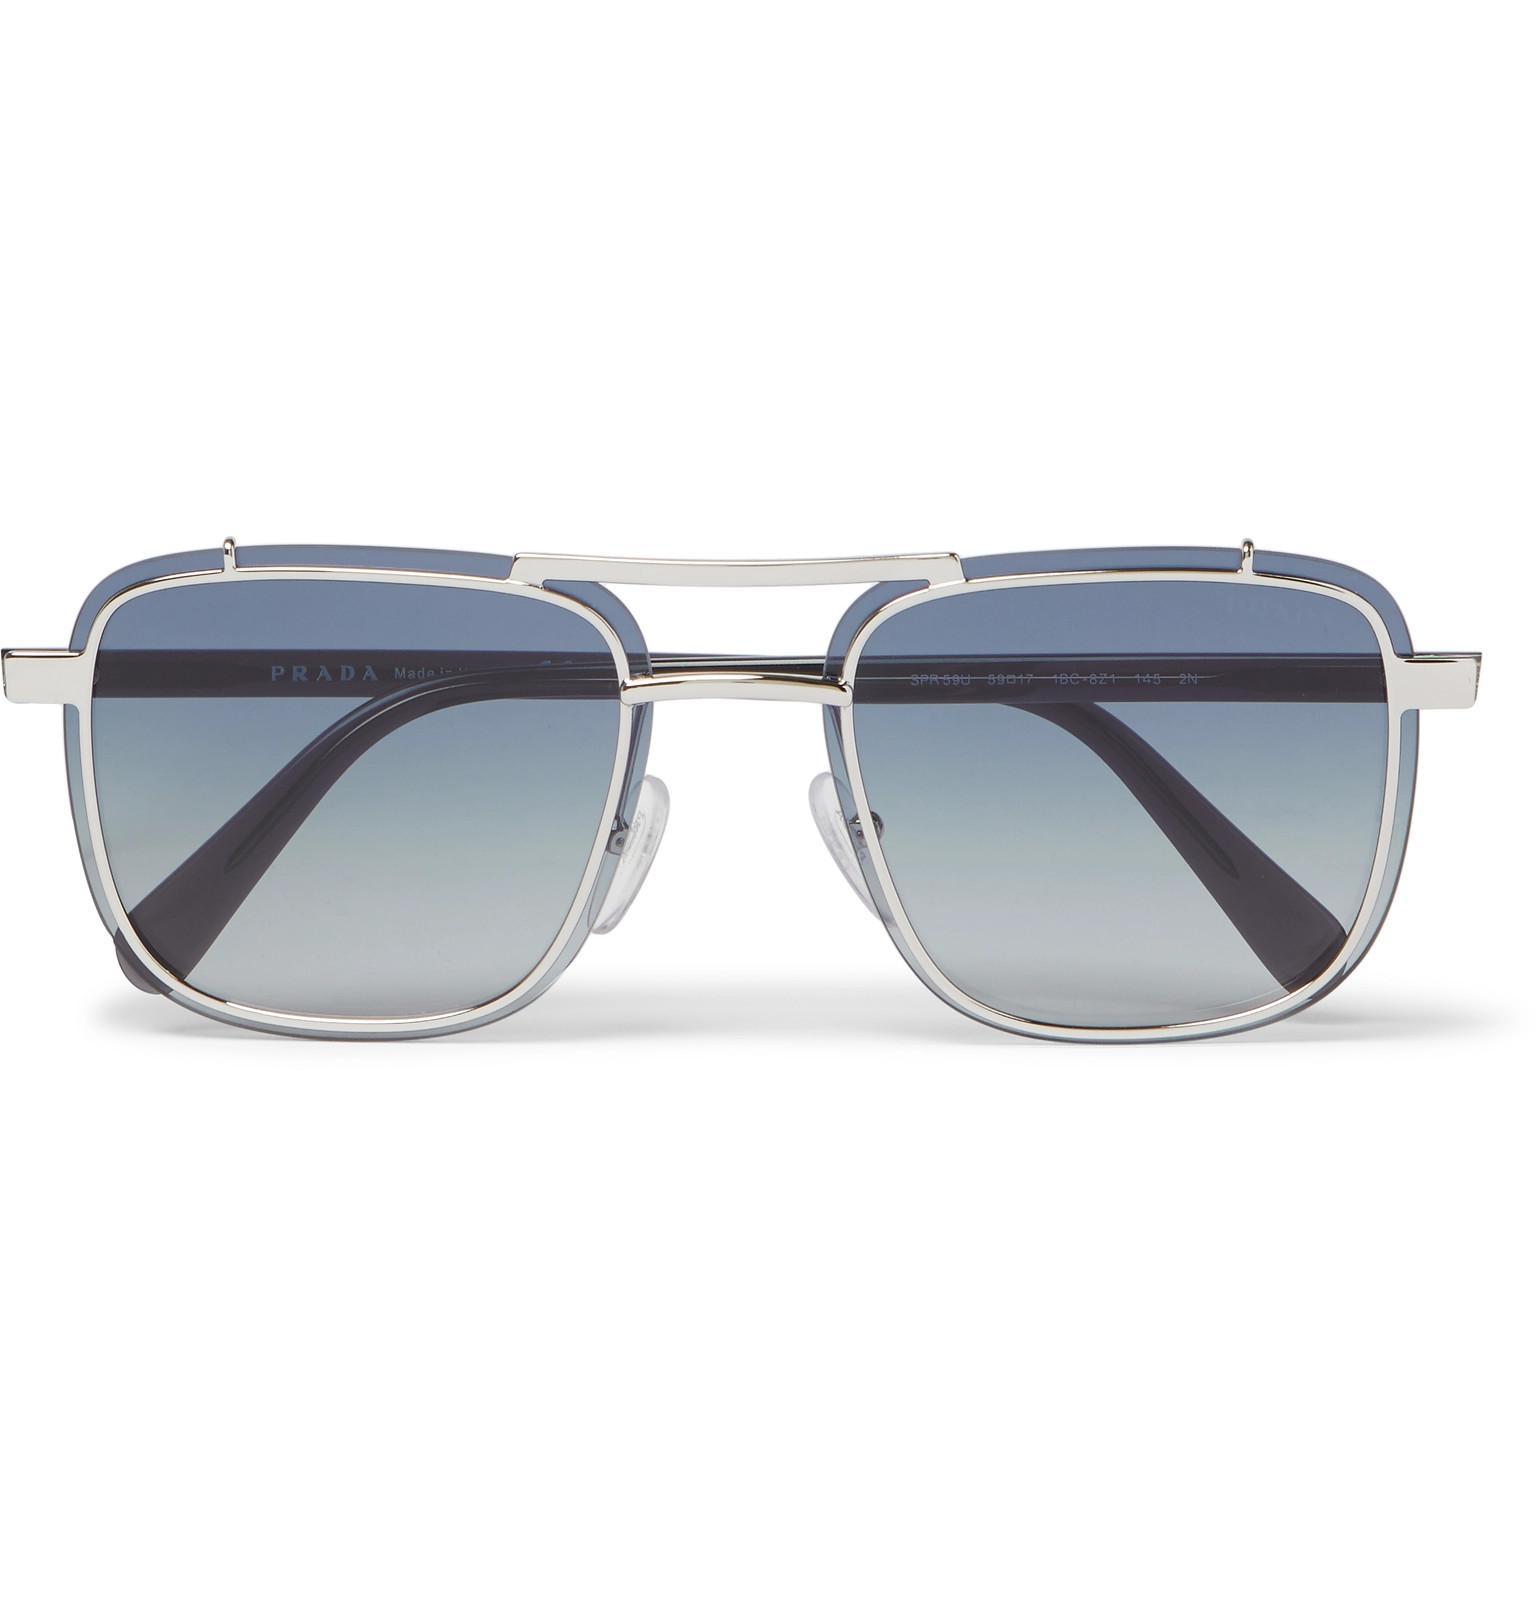 76fb1c43182 Prada Square-frame Silver-tone And Acetate Sunglasses in Metallic ...